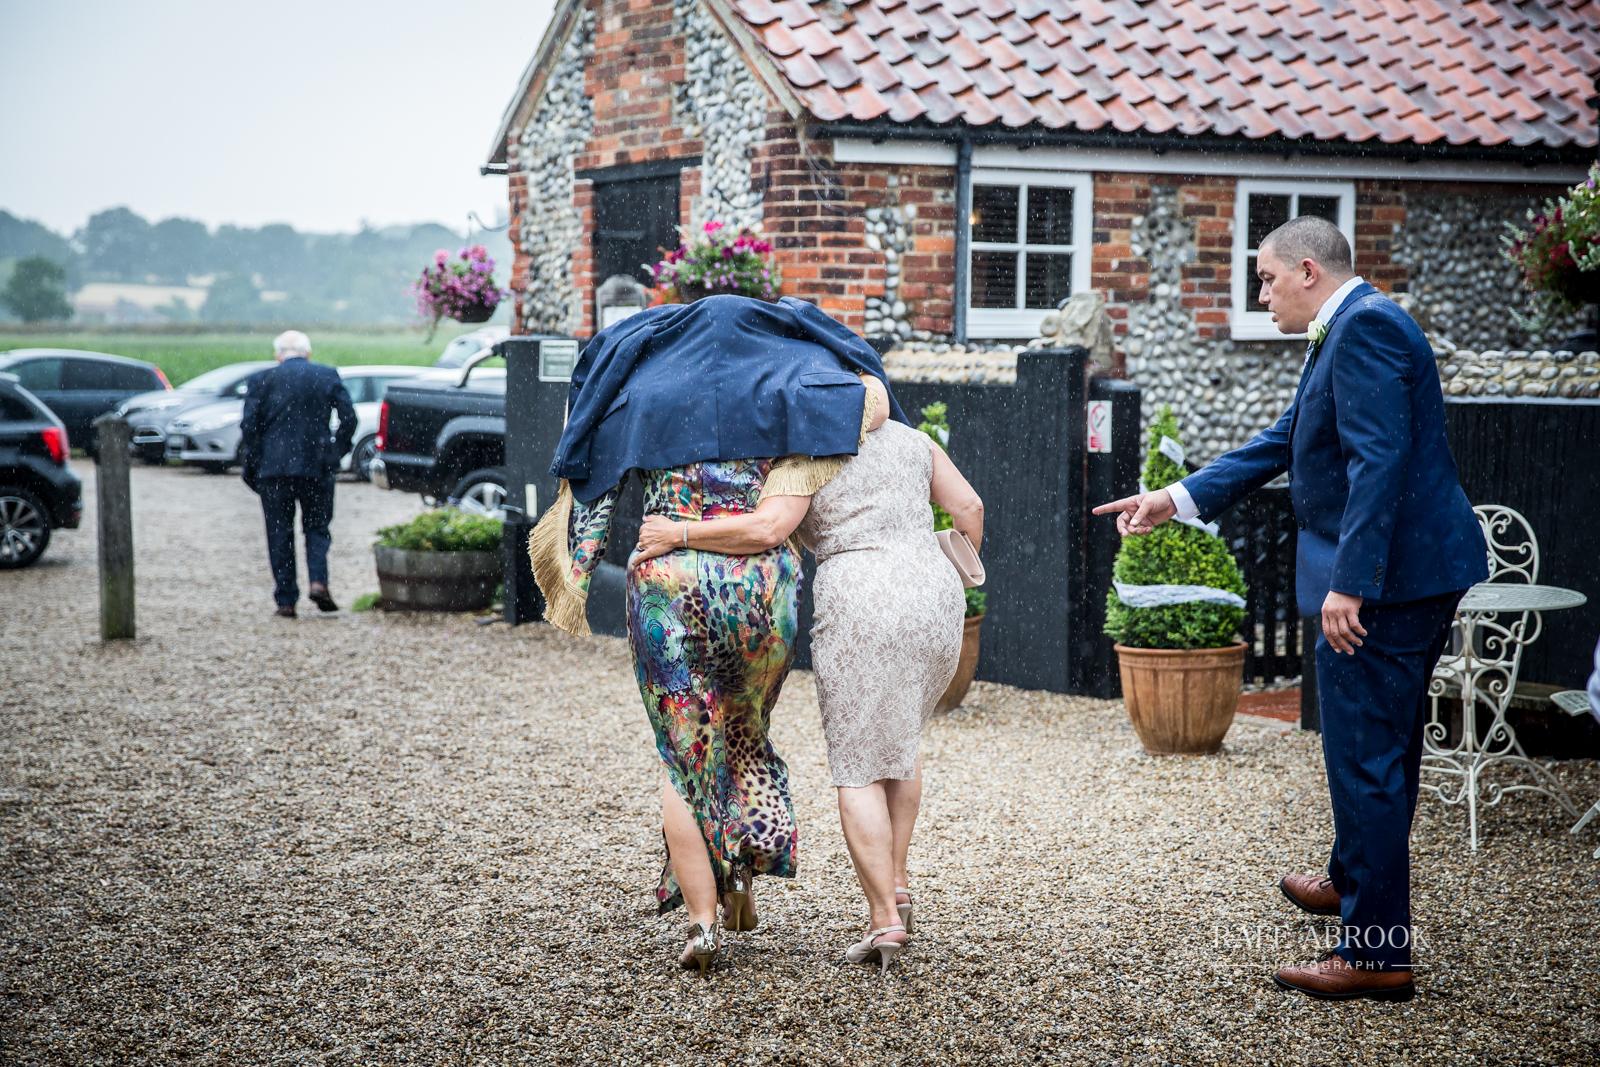 cley windmill wedding norfolk hertfordshire wedding photographer-1226.jpg